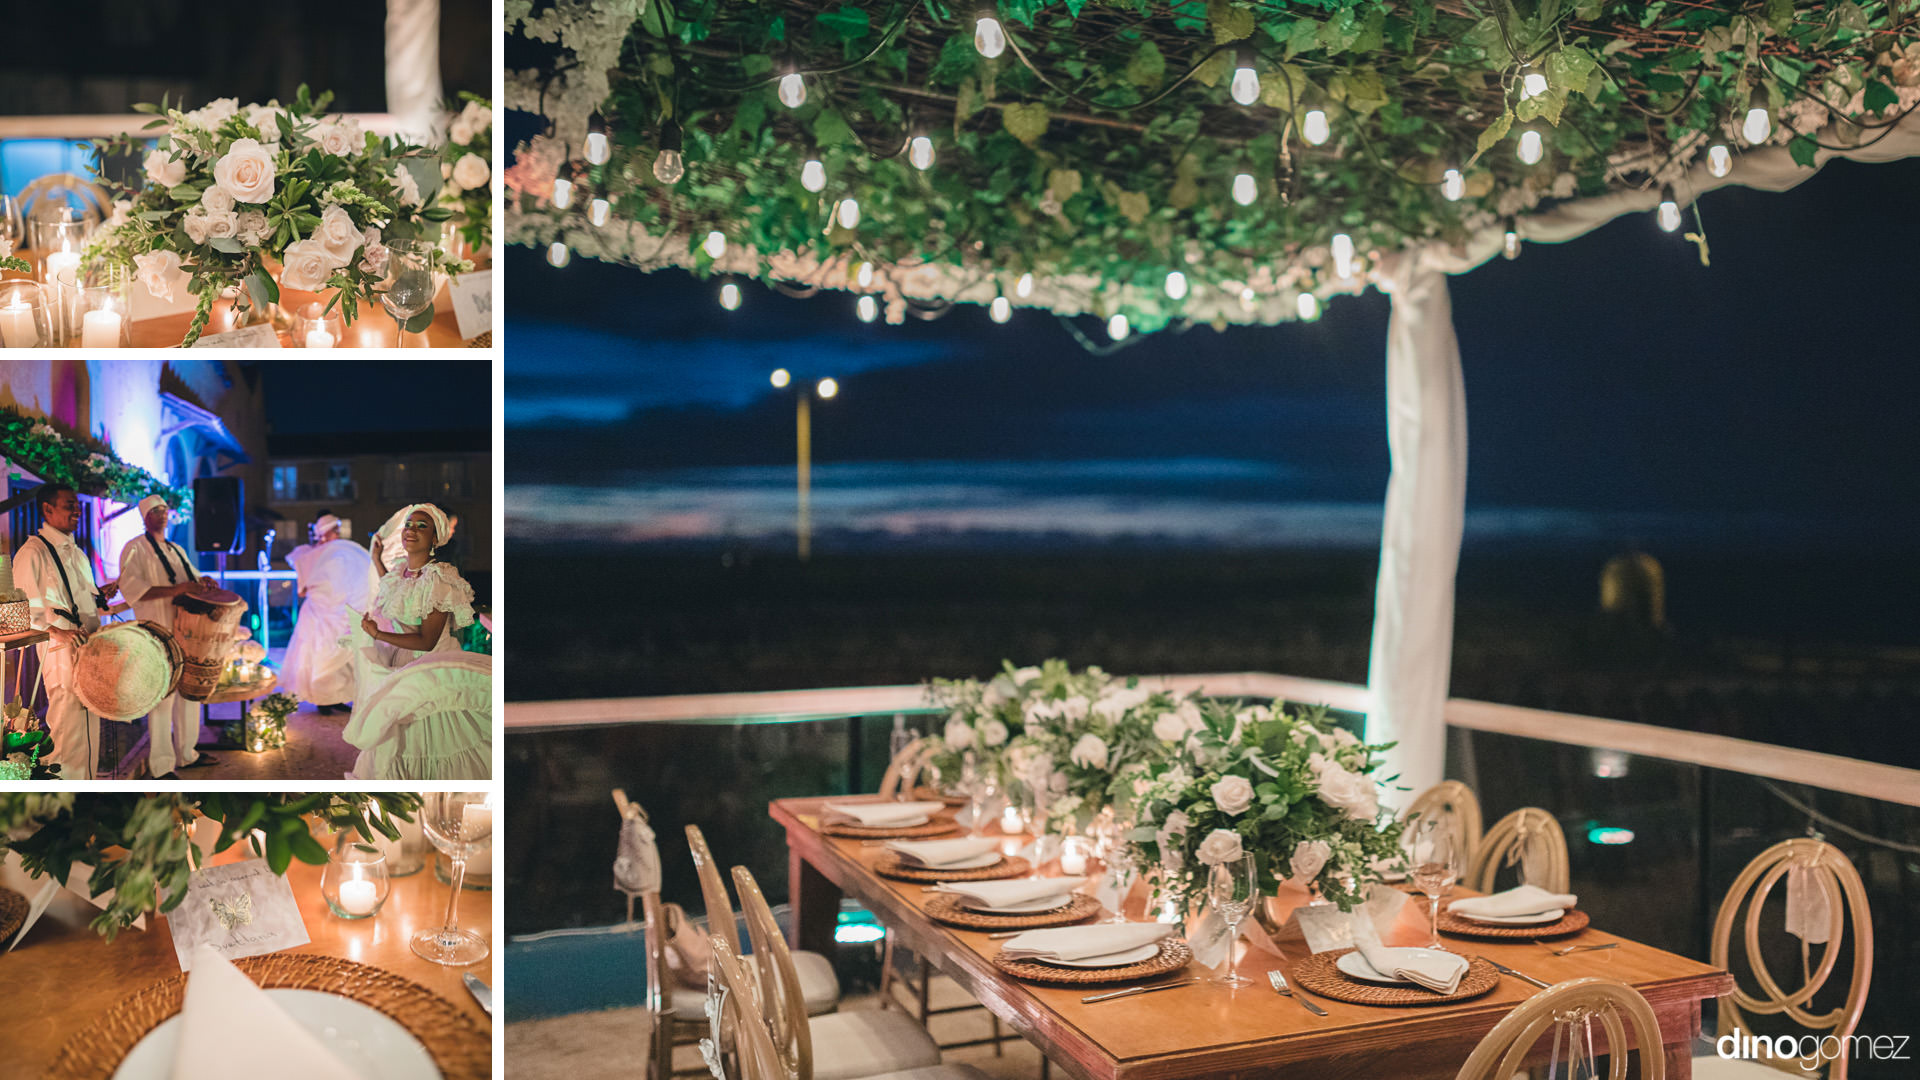 Luxury Destination Wedding Photographer In Cartagena De Indias - St